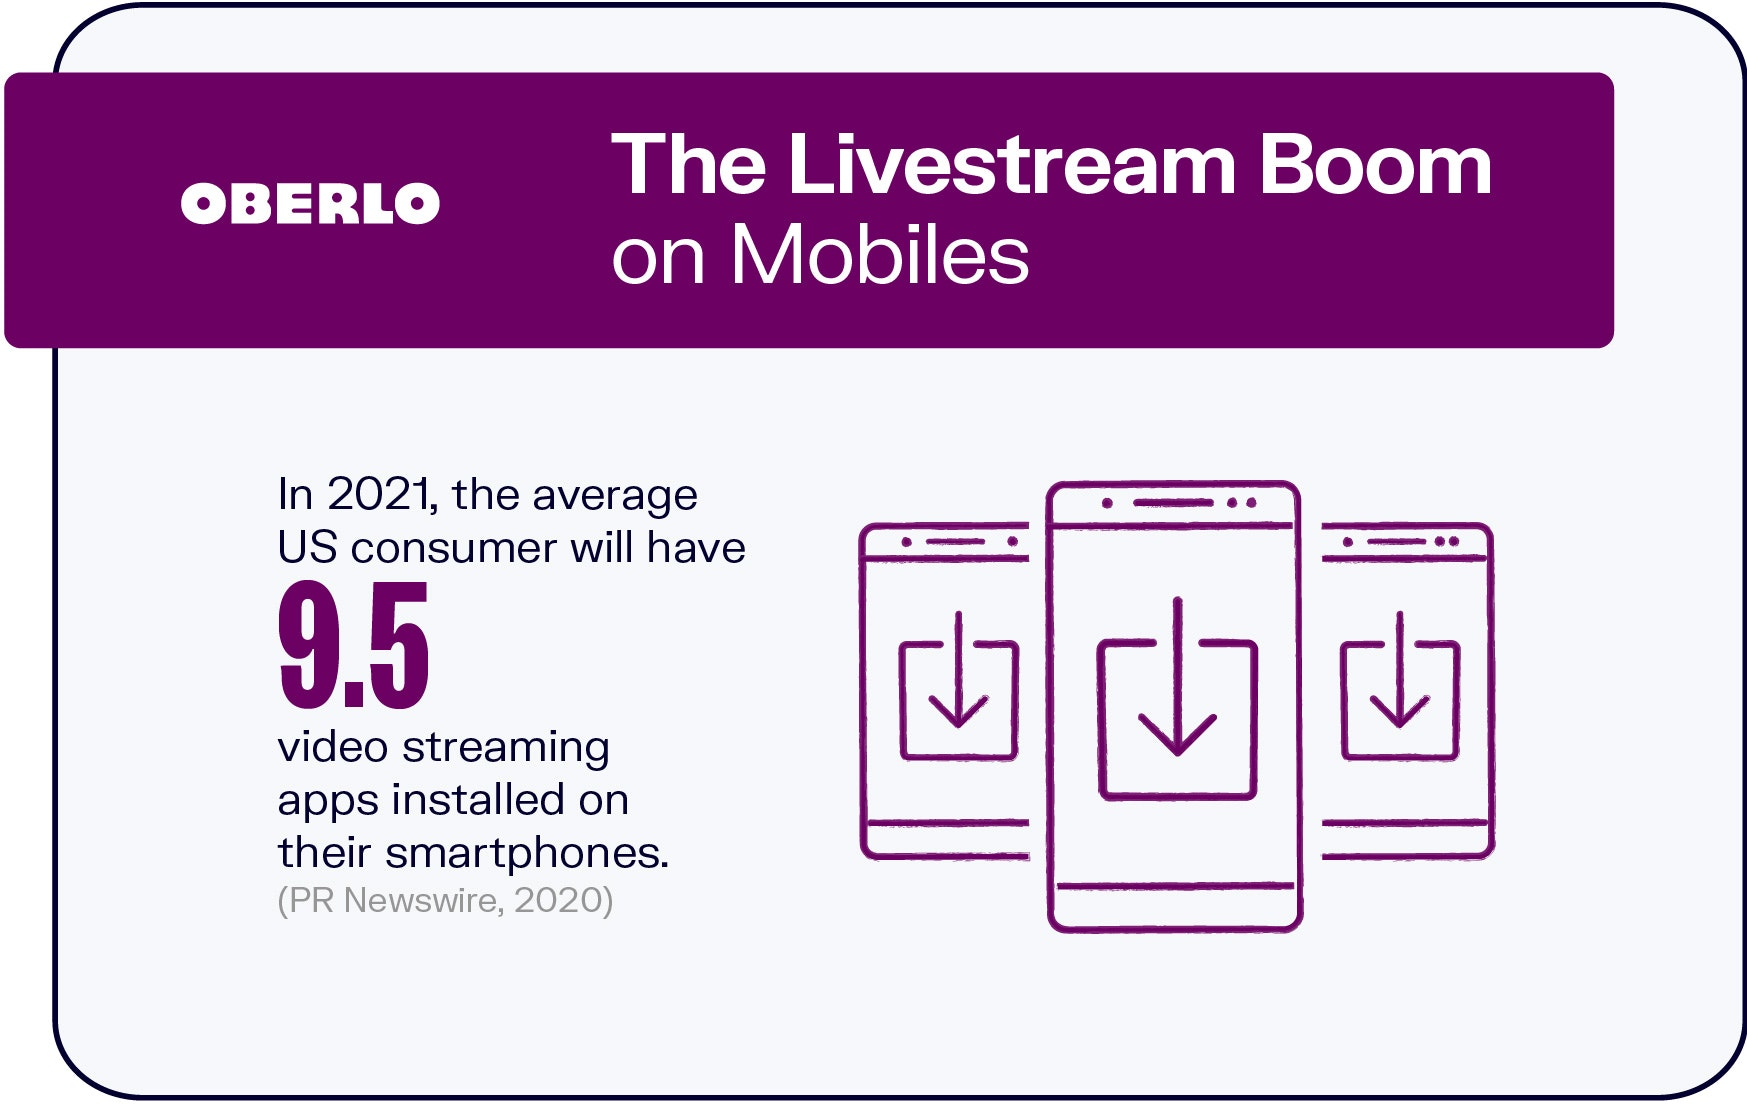 Livestream boom on Mobile